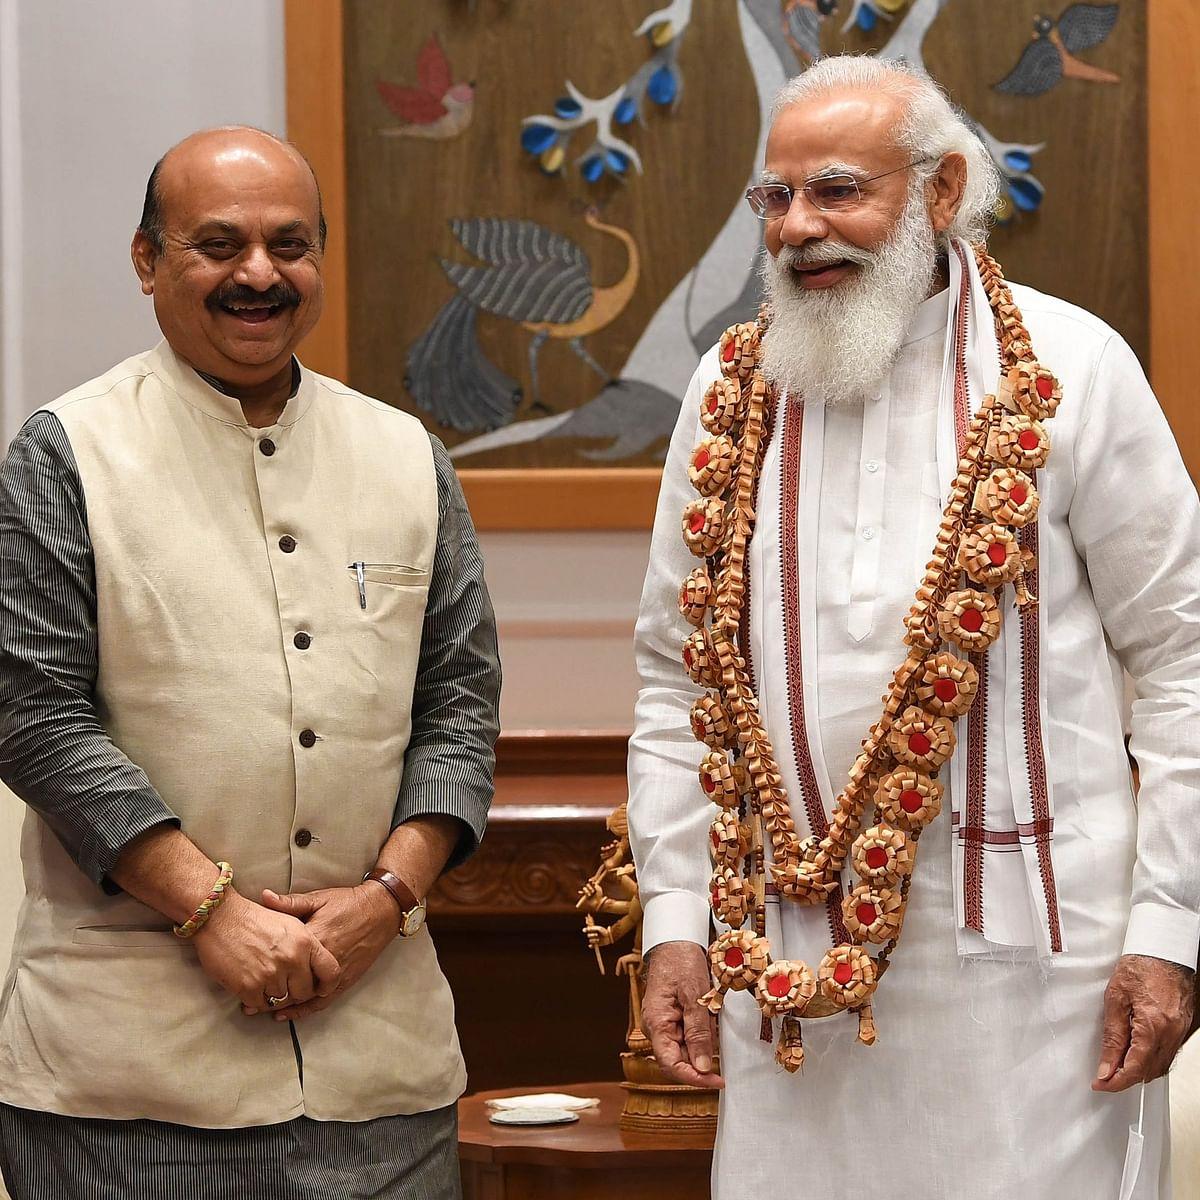 PM Modi meets newly inducted CM Basavaraj S Bommai, assures full support for development of Karnataka